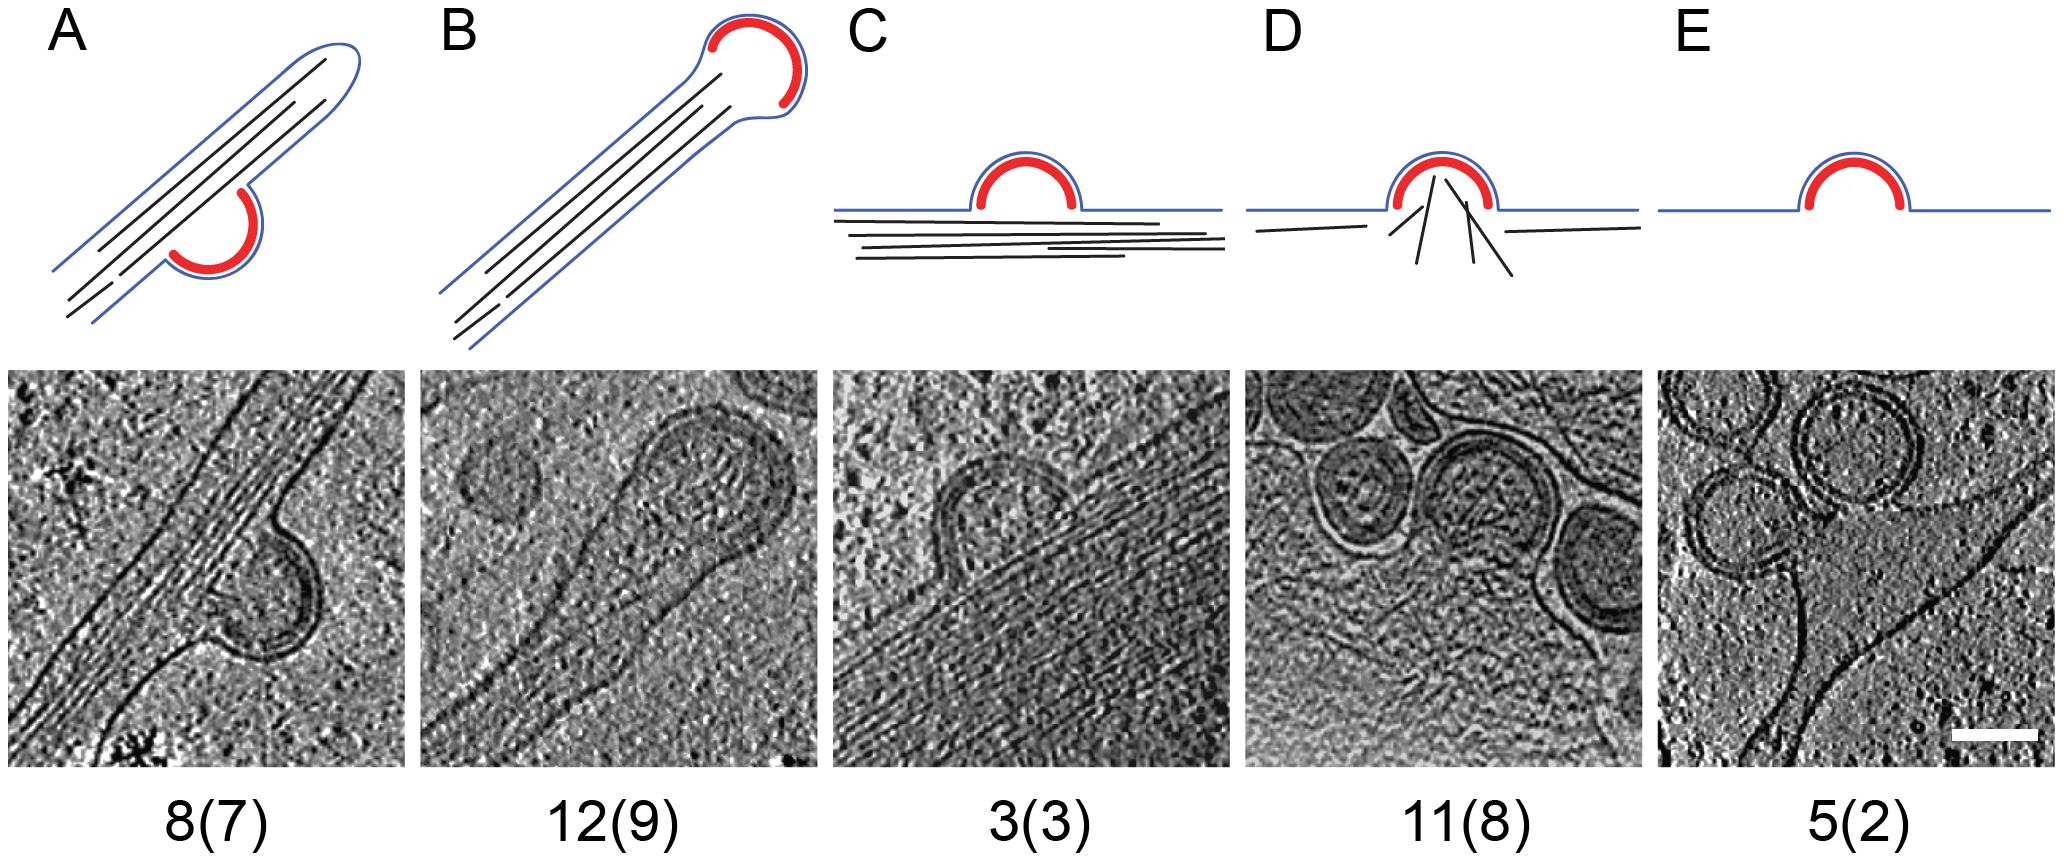 Filamentous actin at HIV-1 budding sites.